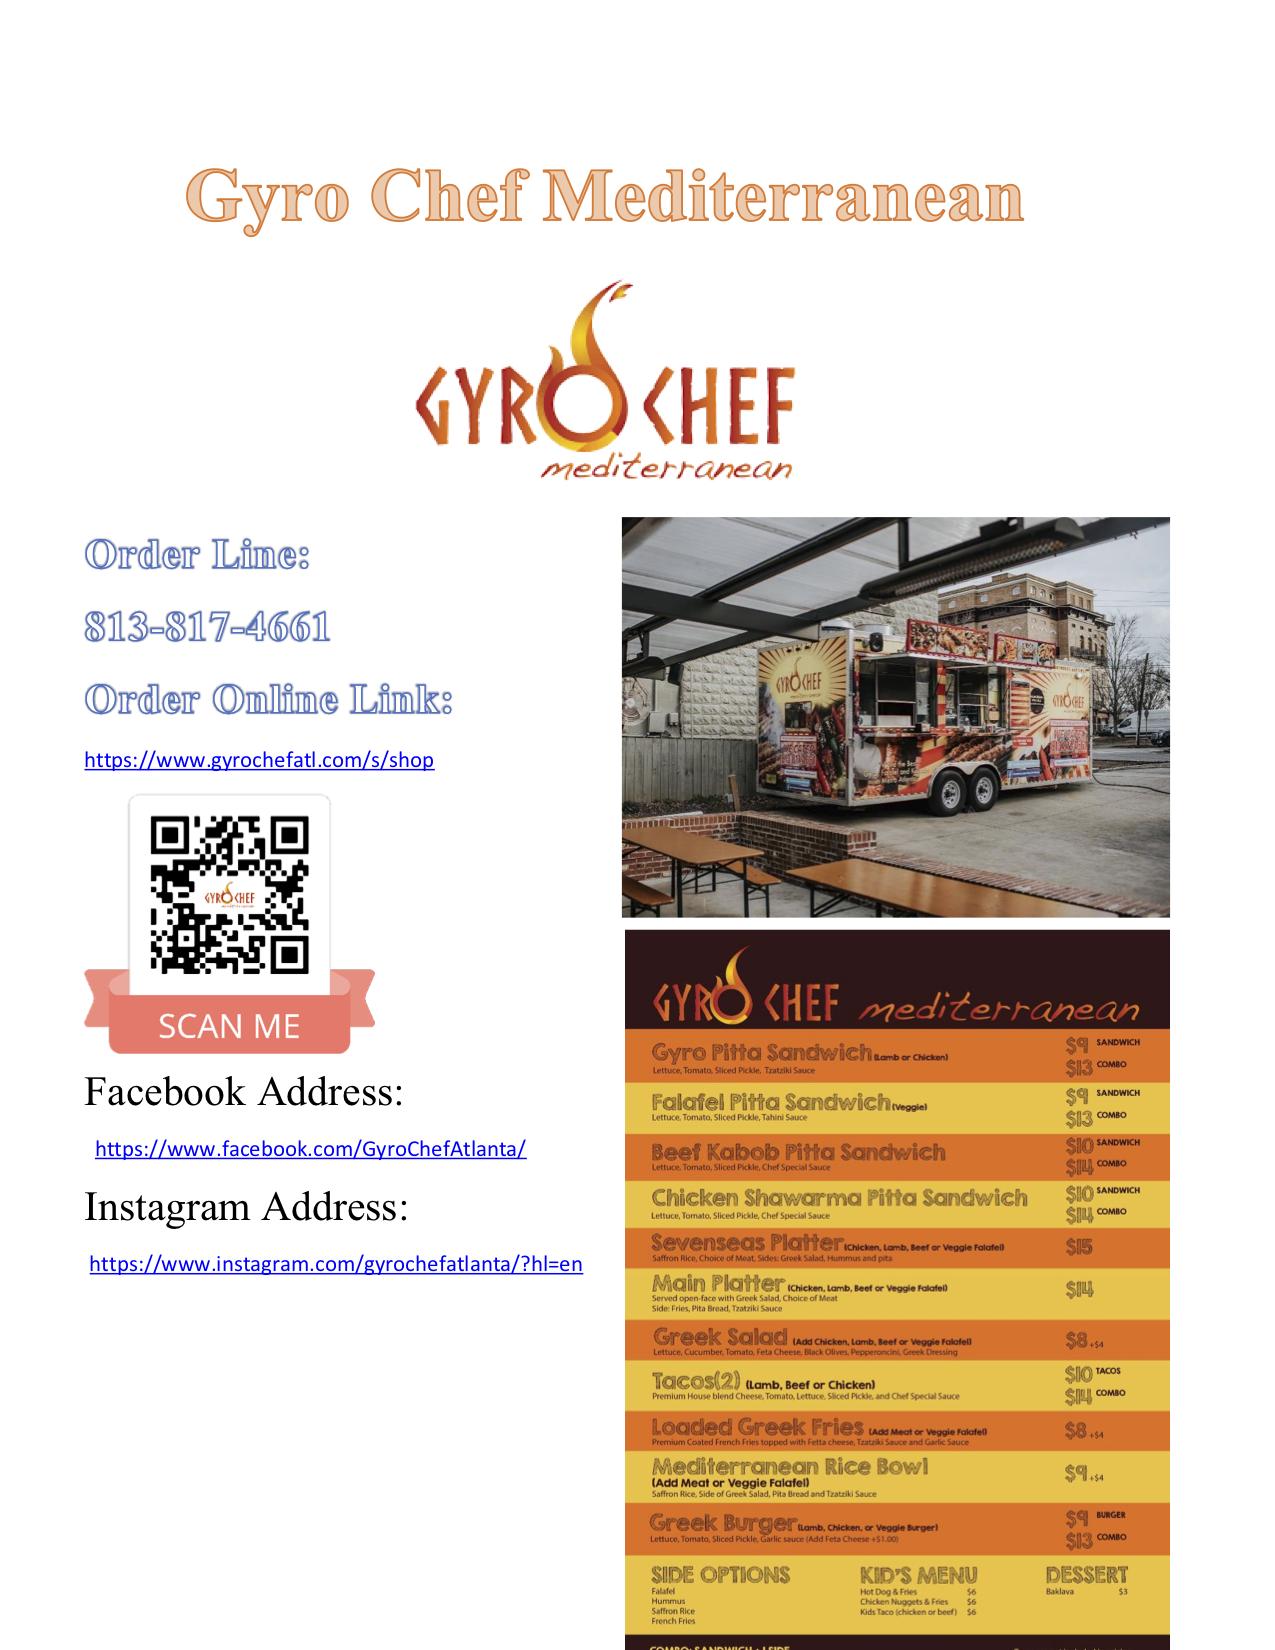 Gyro Chef Mediterranean